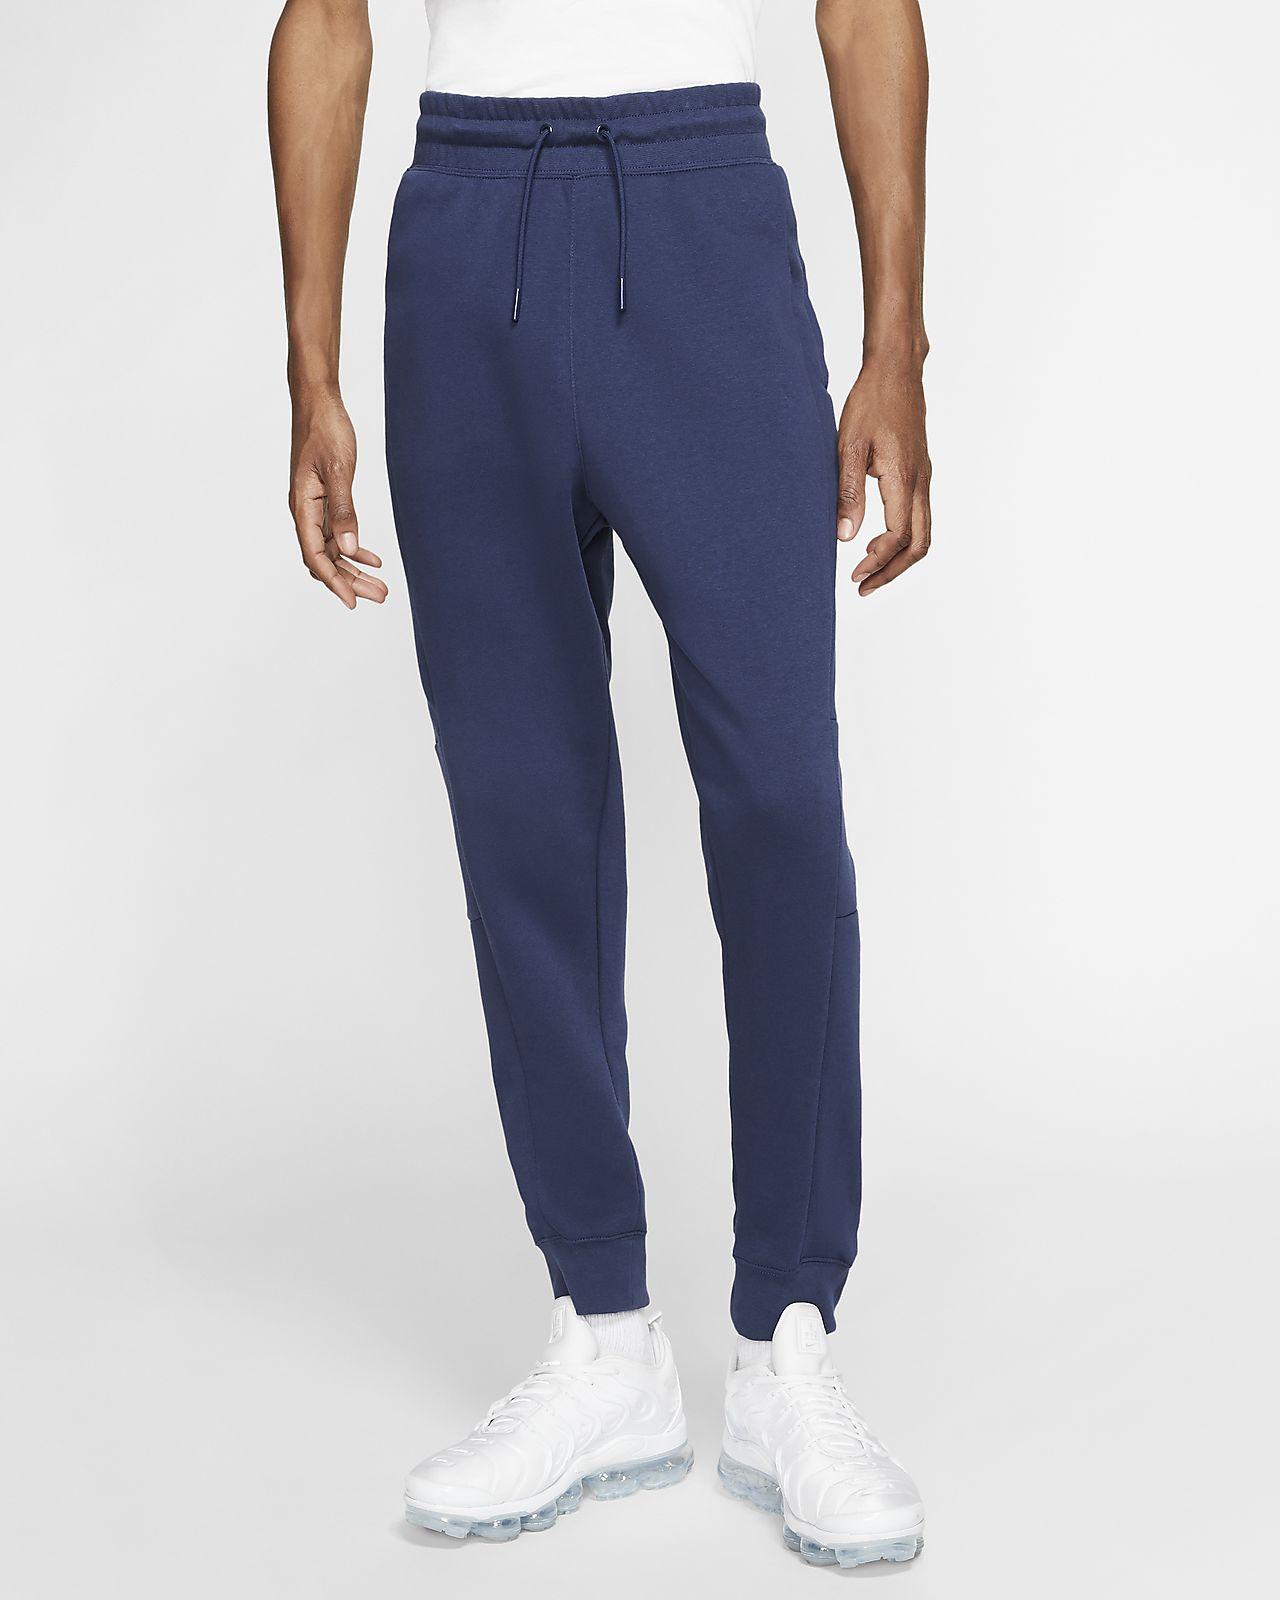 Nike Air Pantalons de teixit Fleece - Home